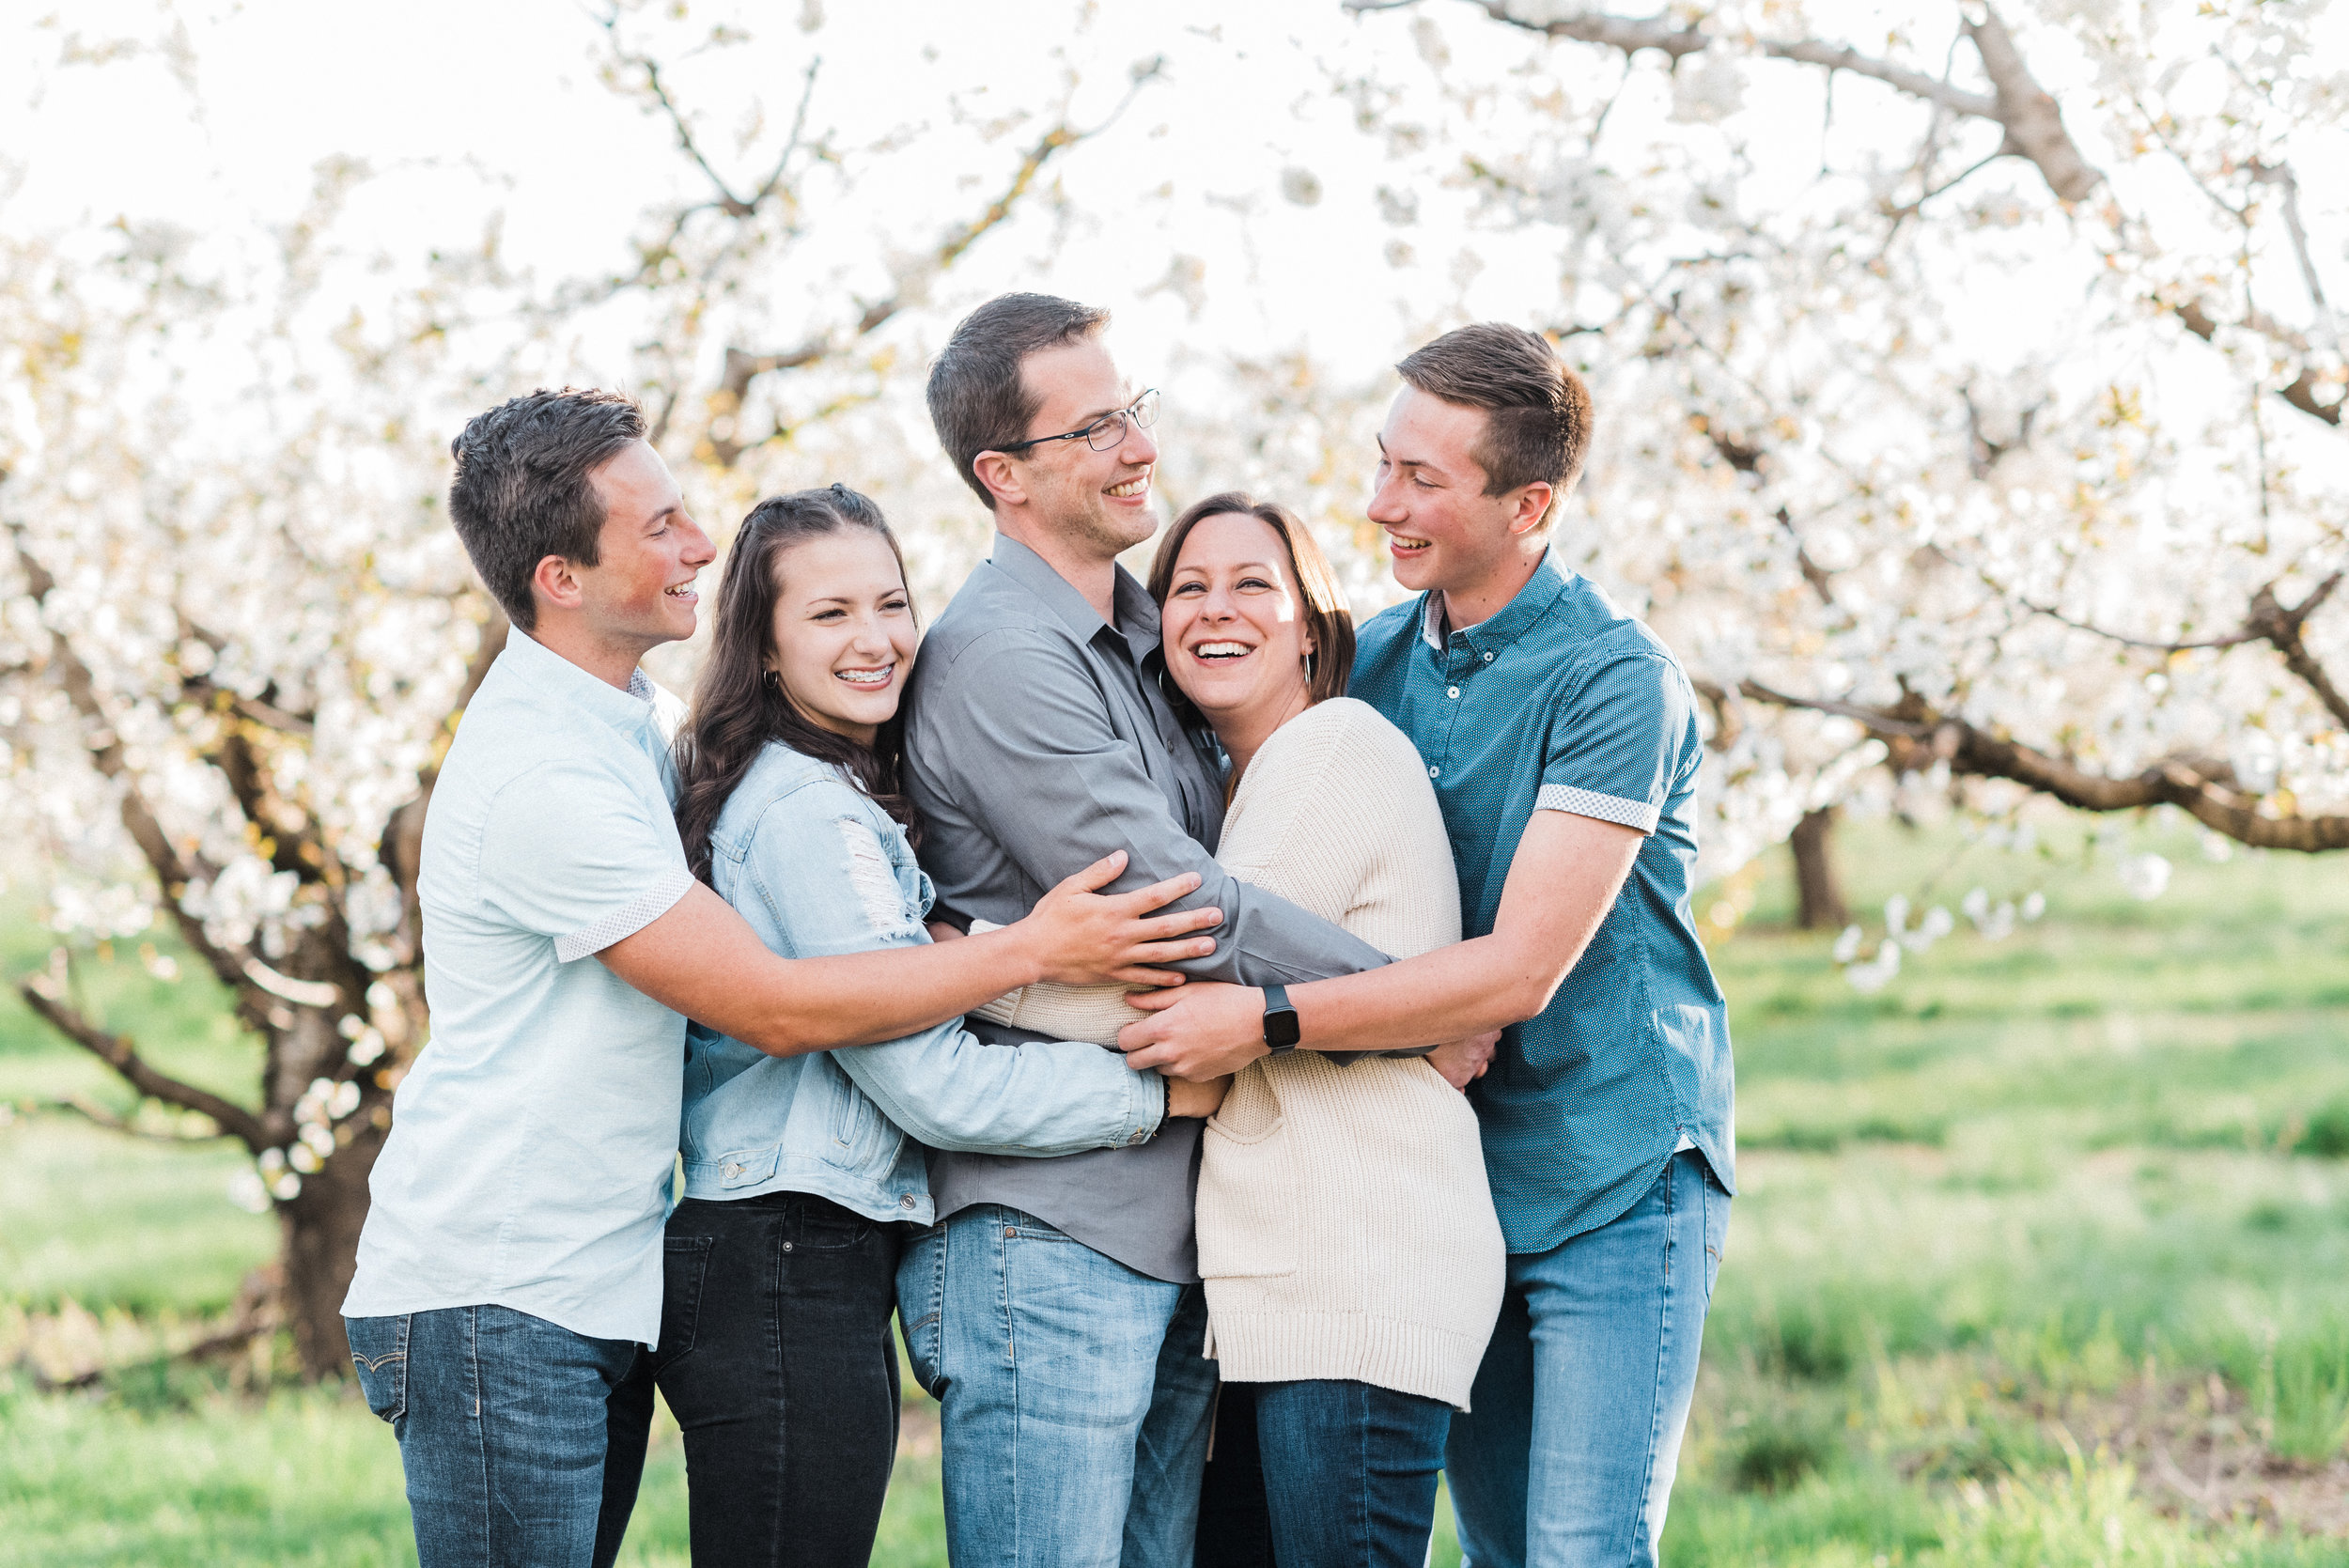 orchard_family_session_spokane_wa-7.jpg